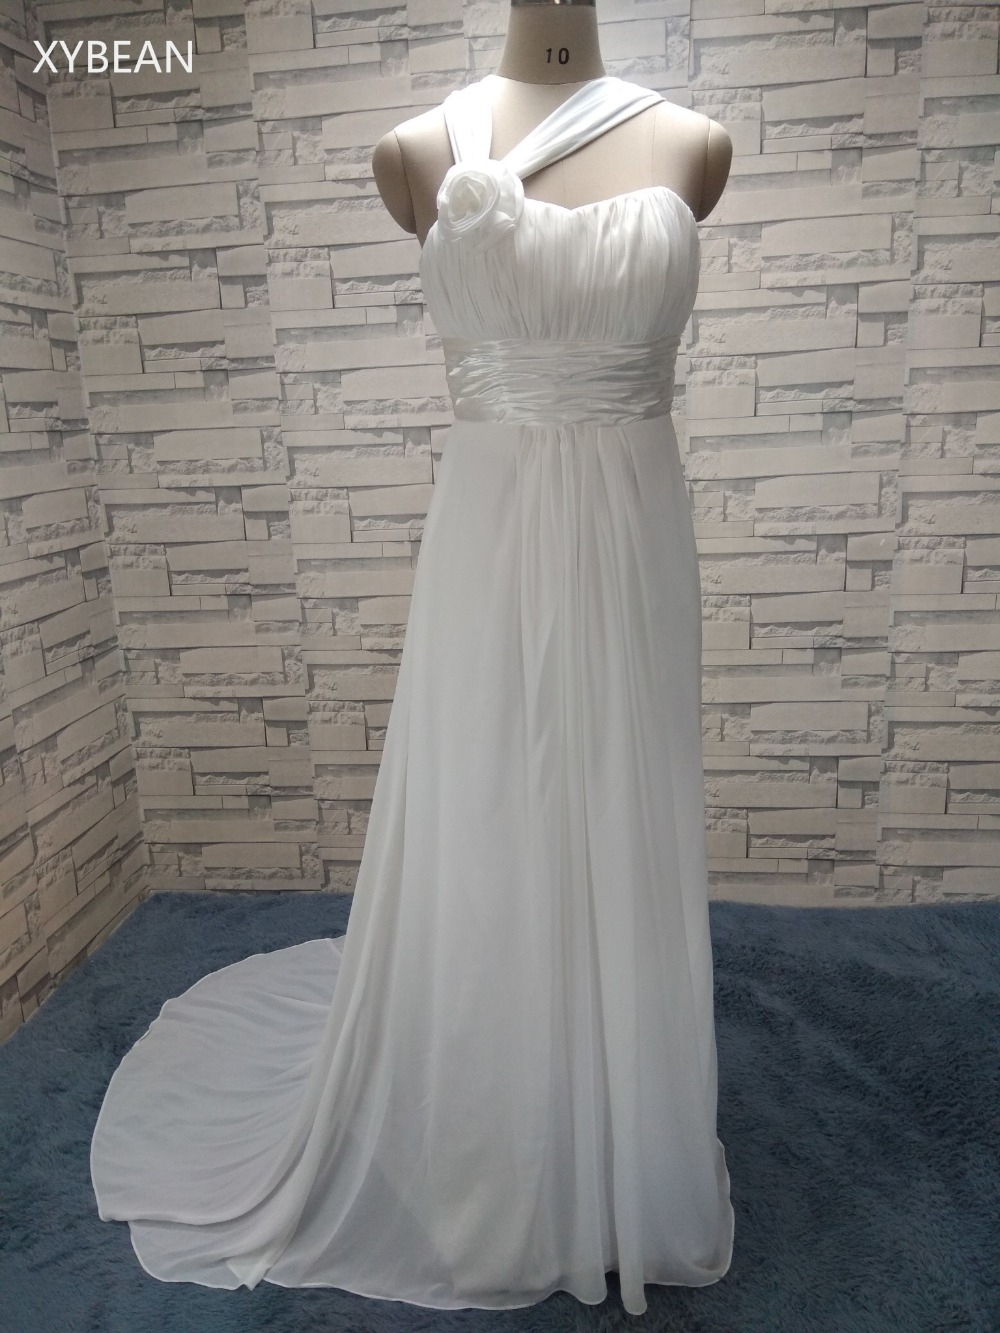 2017 New Free Shipping Halter Straps Handmade Flower Chiffon Beach White Ivory Wedding Dresses